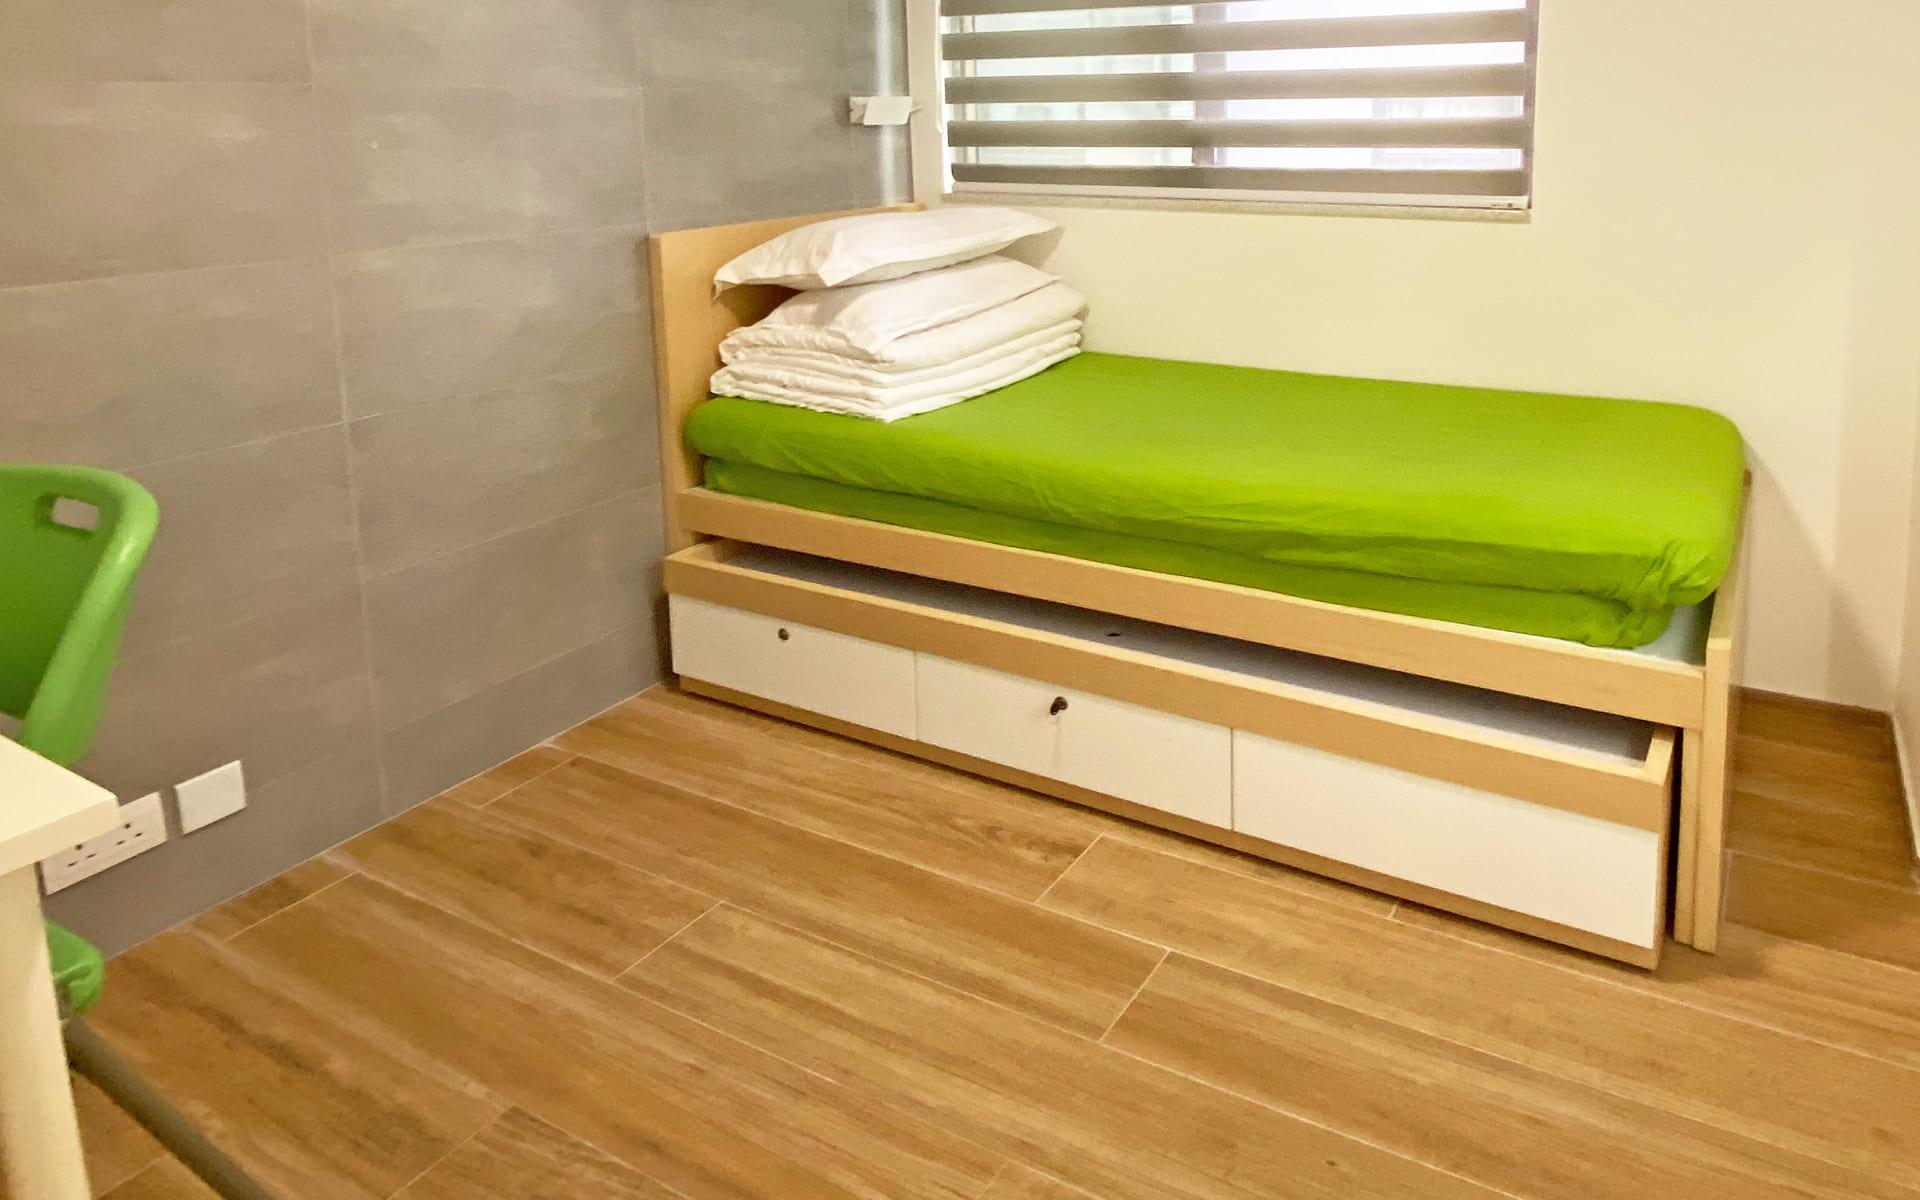 hk_service_apartment_11406387831593399938.jpg